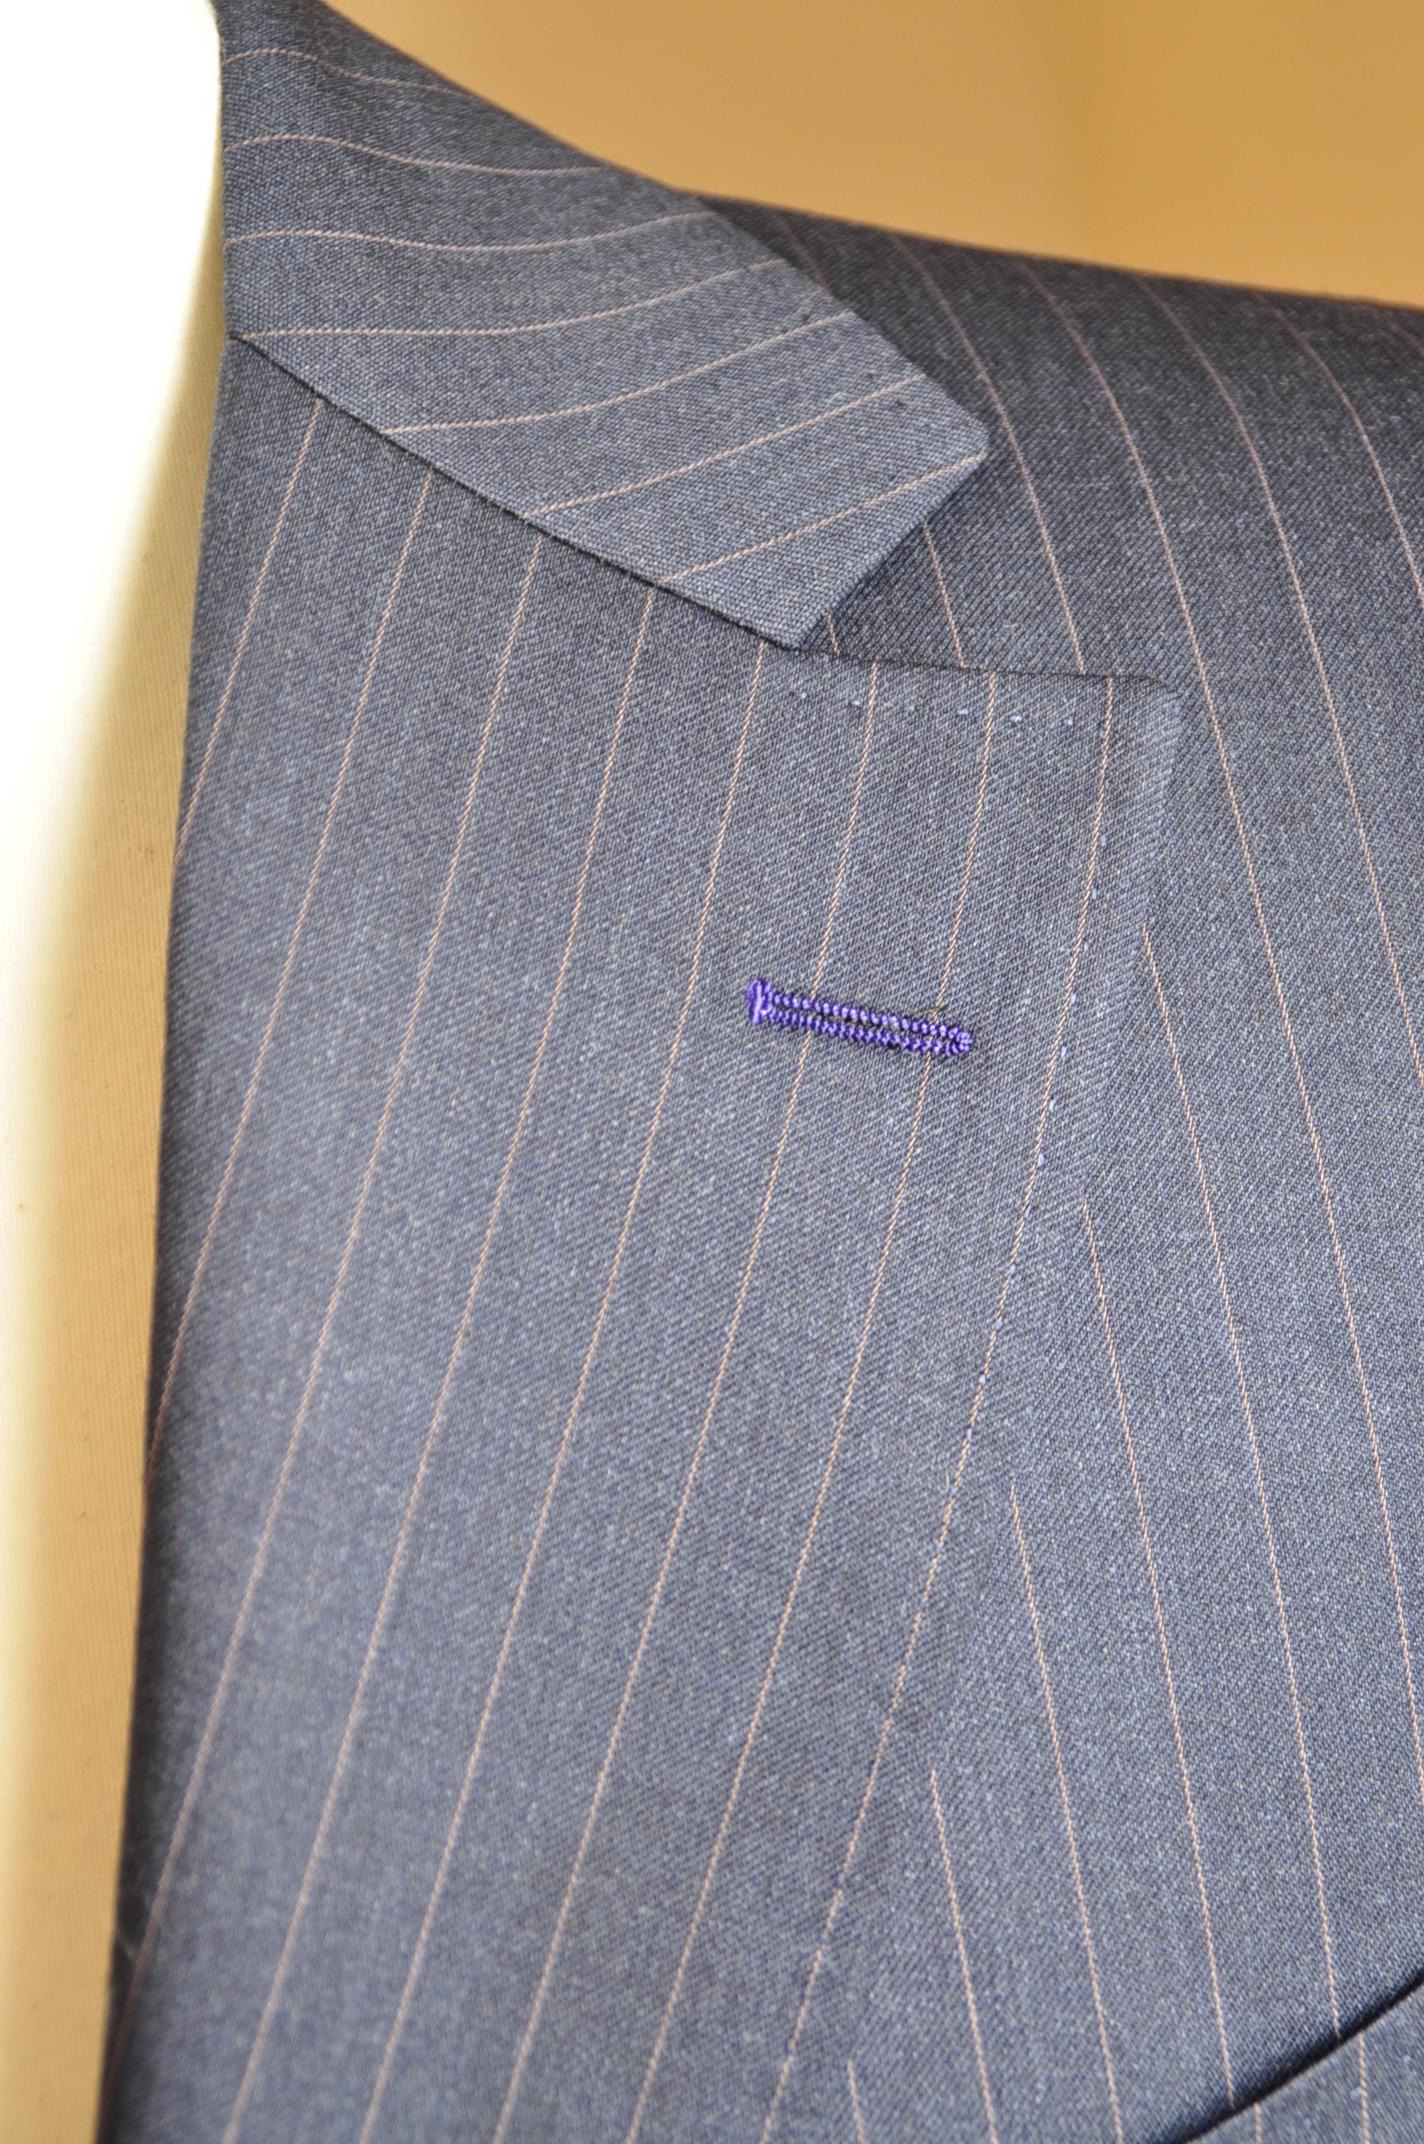 DSC05981 ボタンホール糸色変更 名古屋の完全予約制オーダースーツ専門店DEFFERT